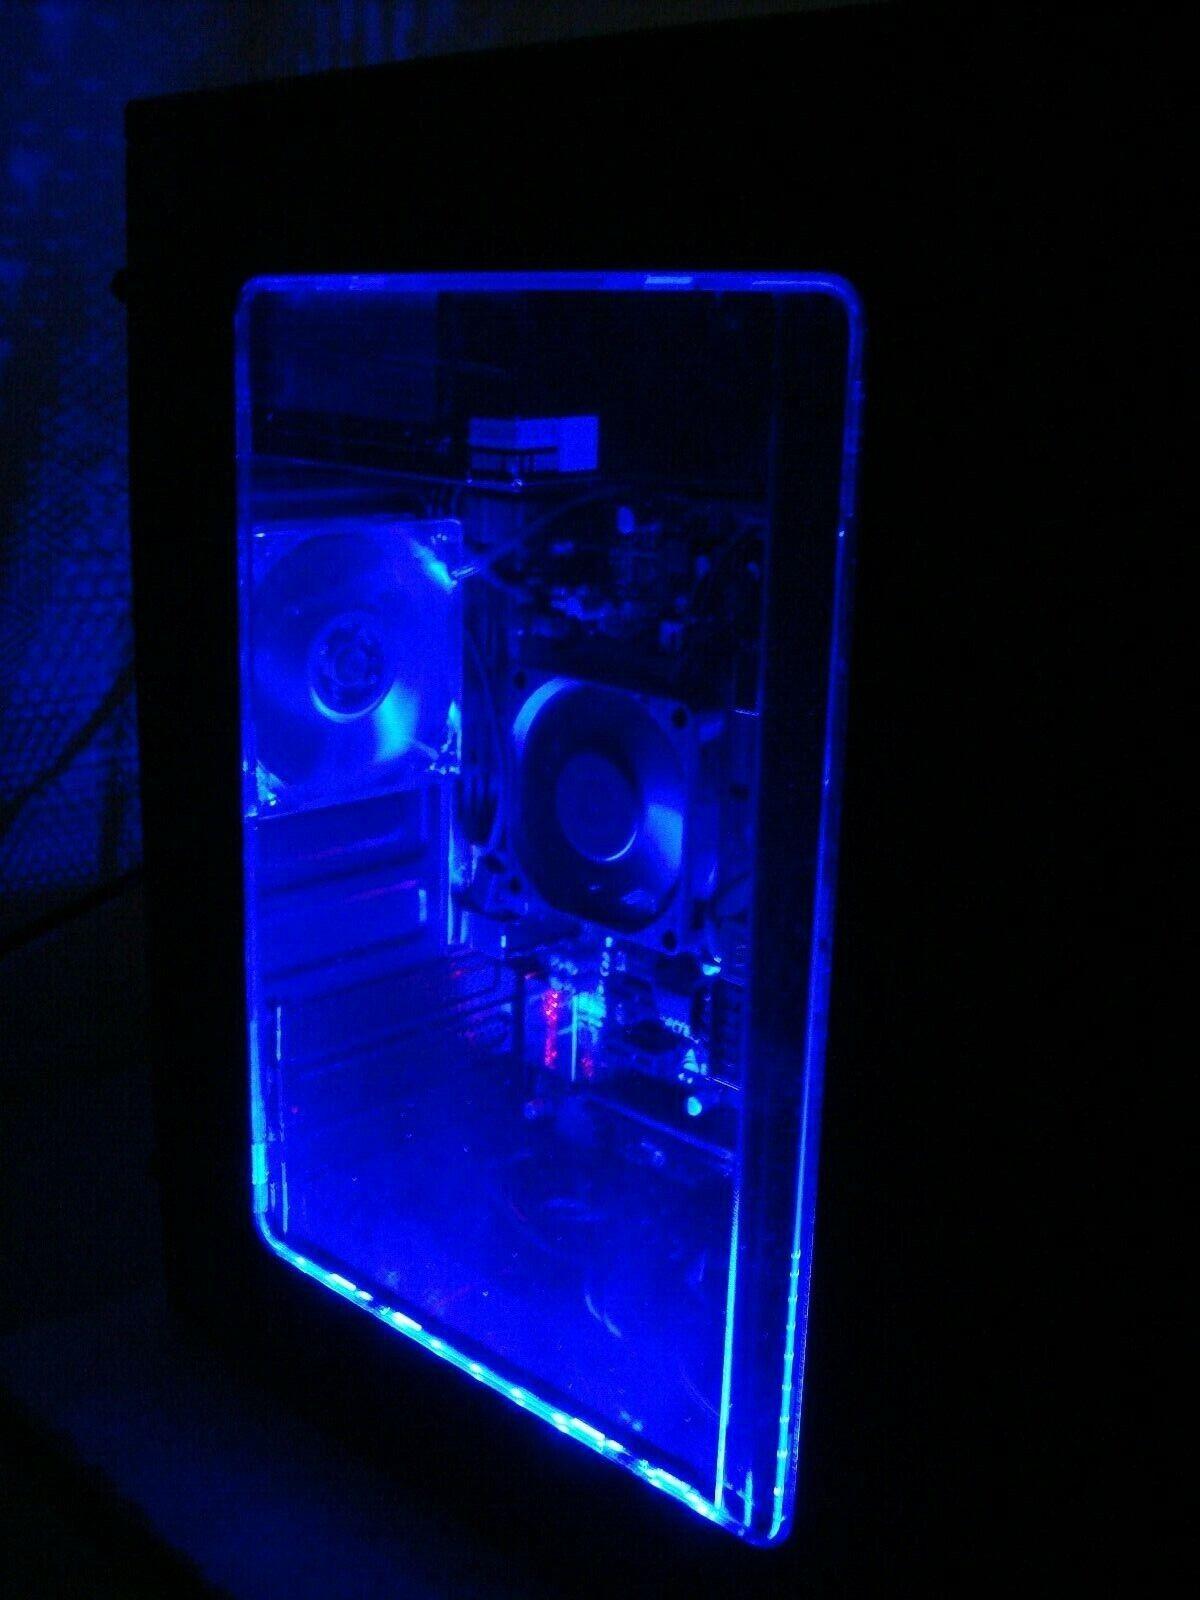 Gaming Desktop PC/ 12-core R7 Graphics 8GB 2133 MHz 120GB SSD 1TB HDD Windows 10